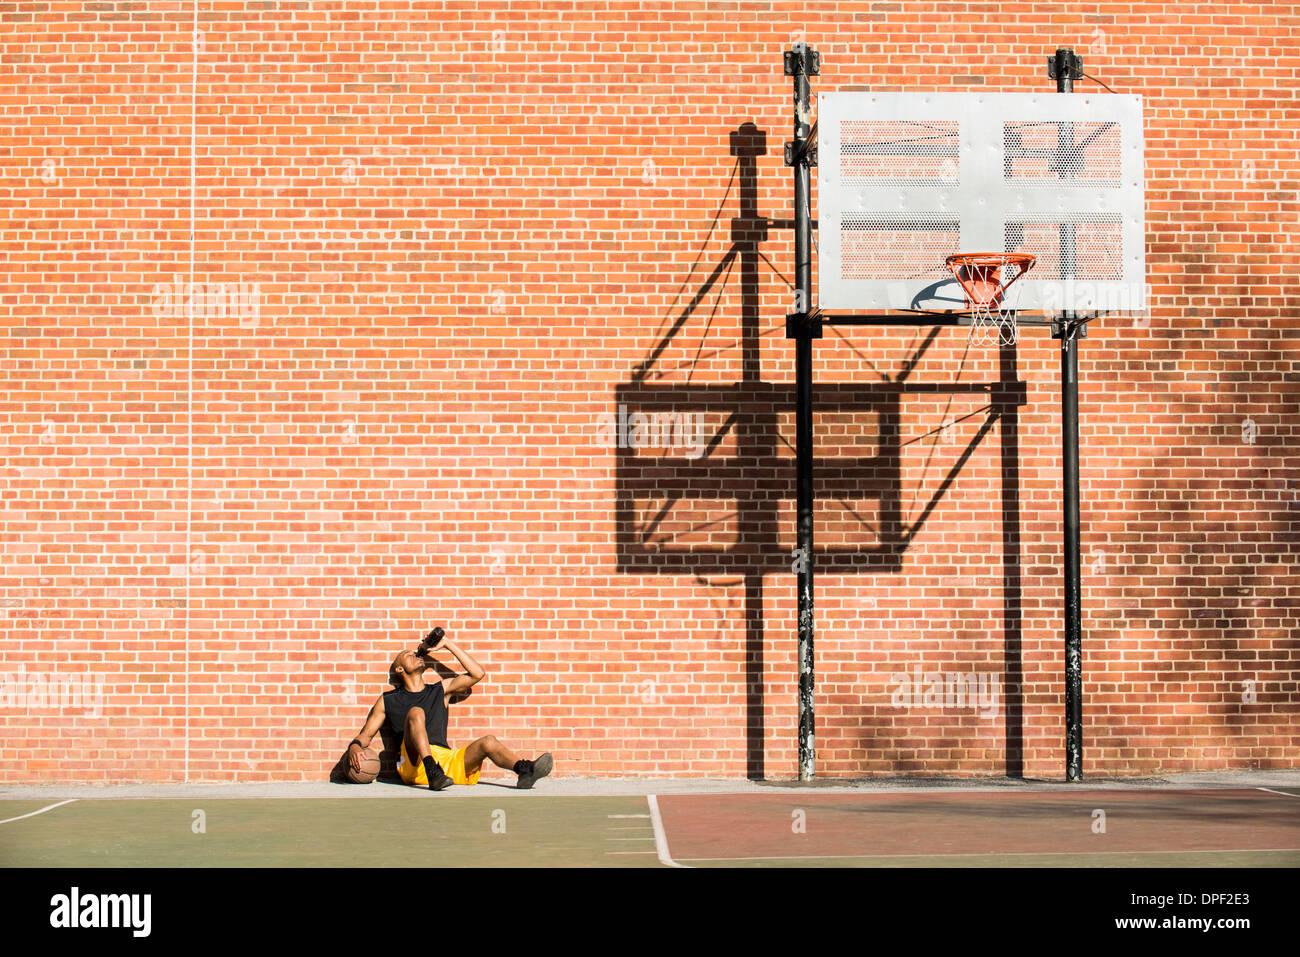 Basketball-Spieler ruht auf Gericht Stockbild